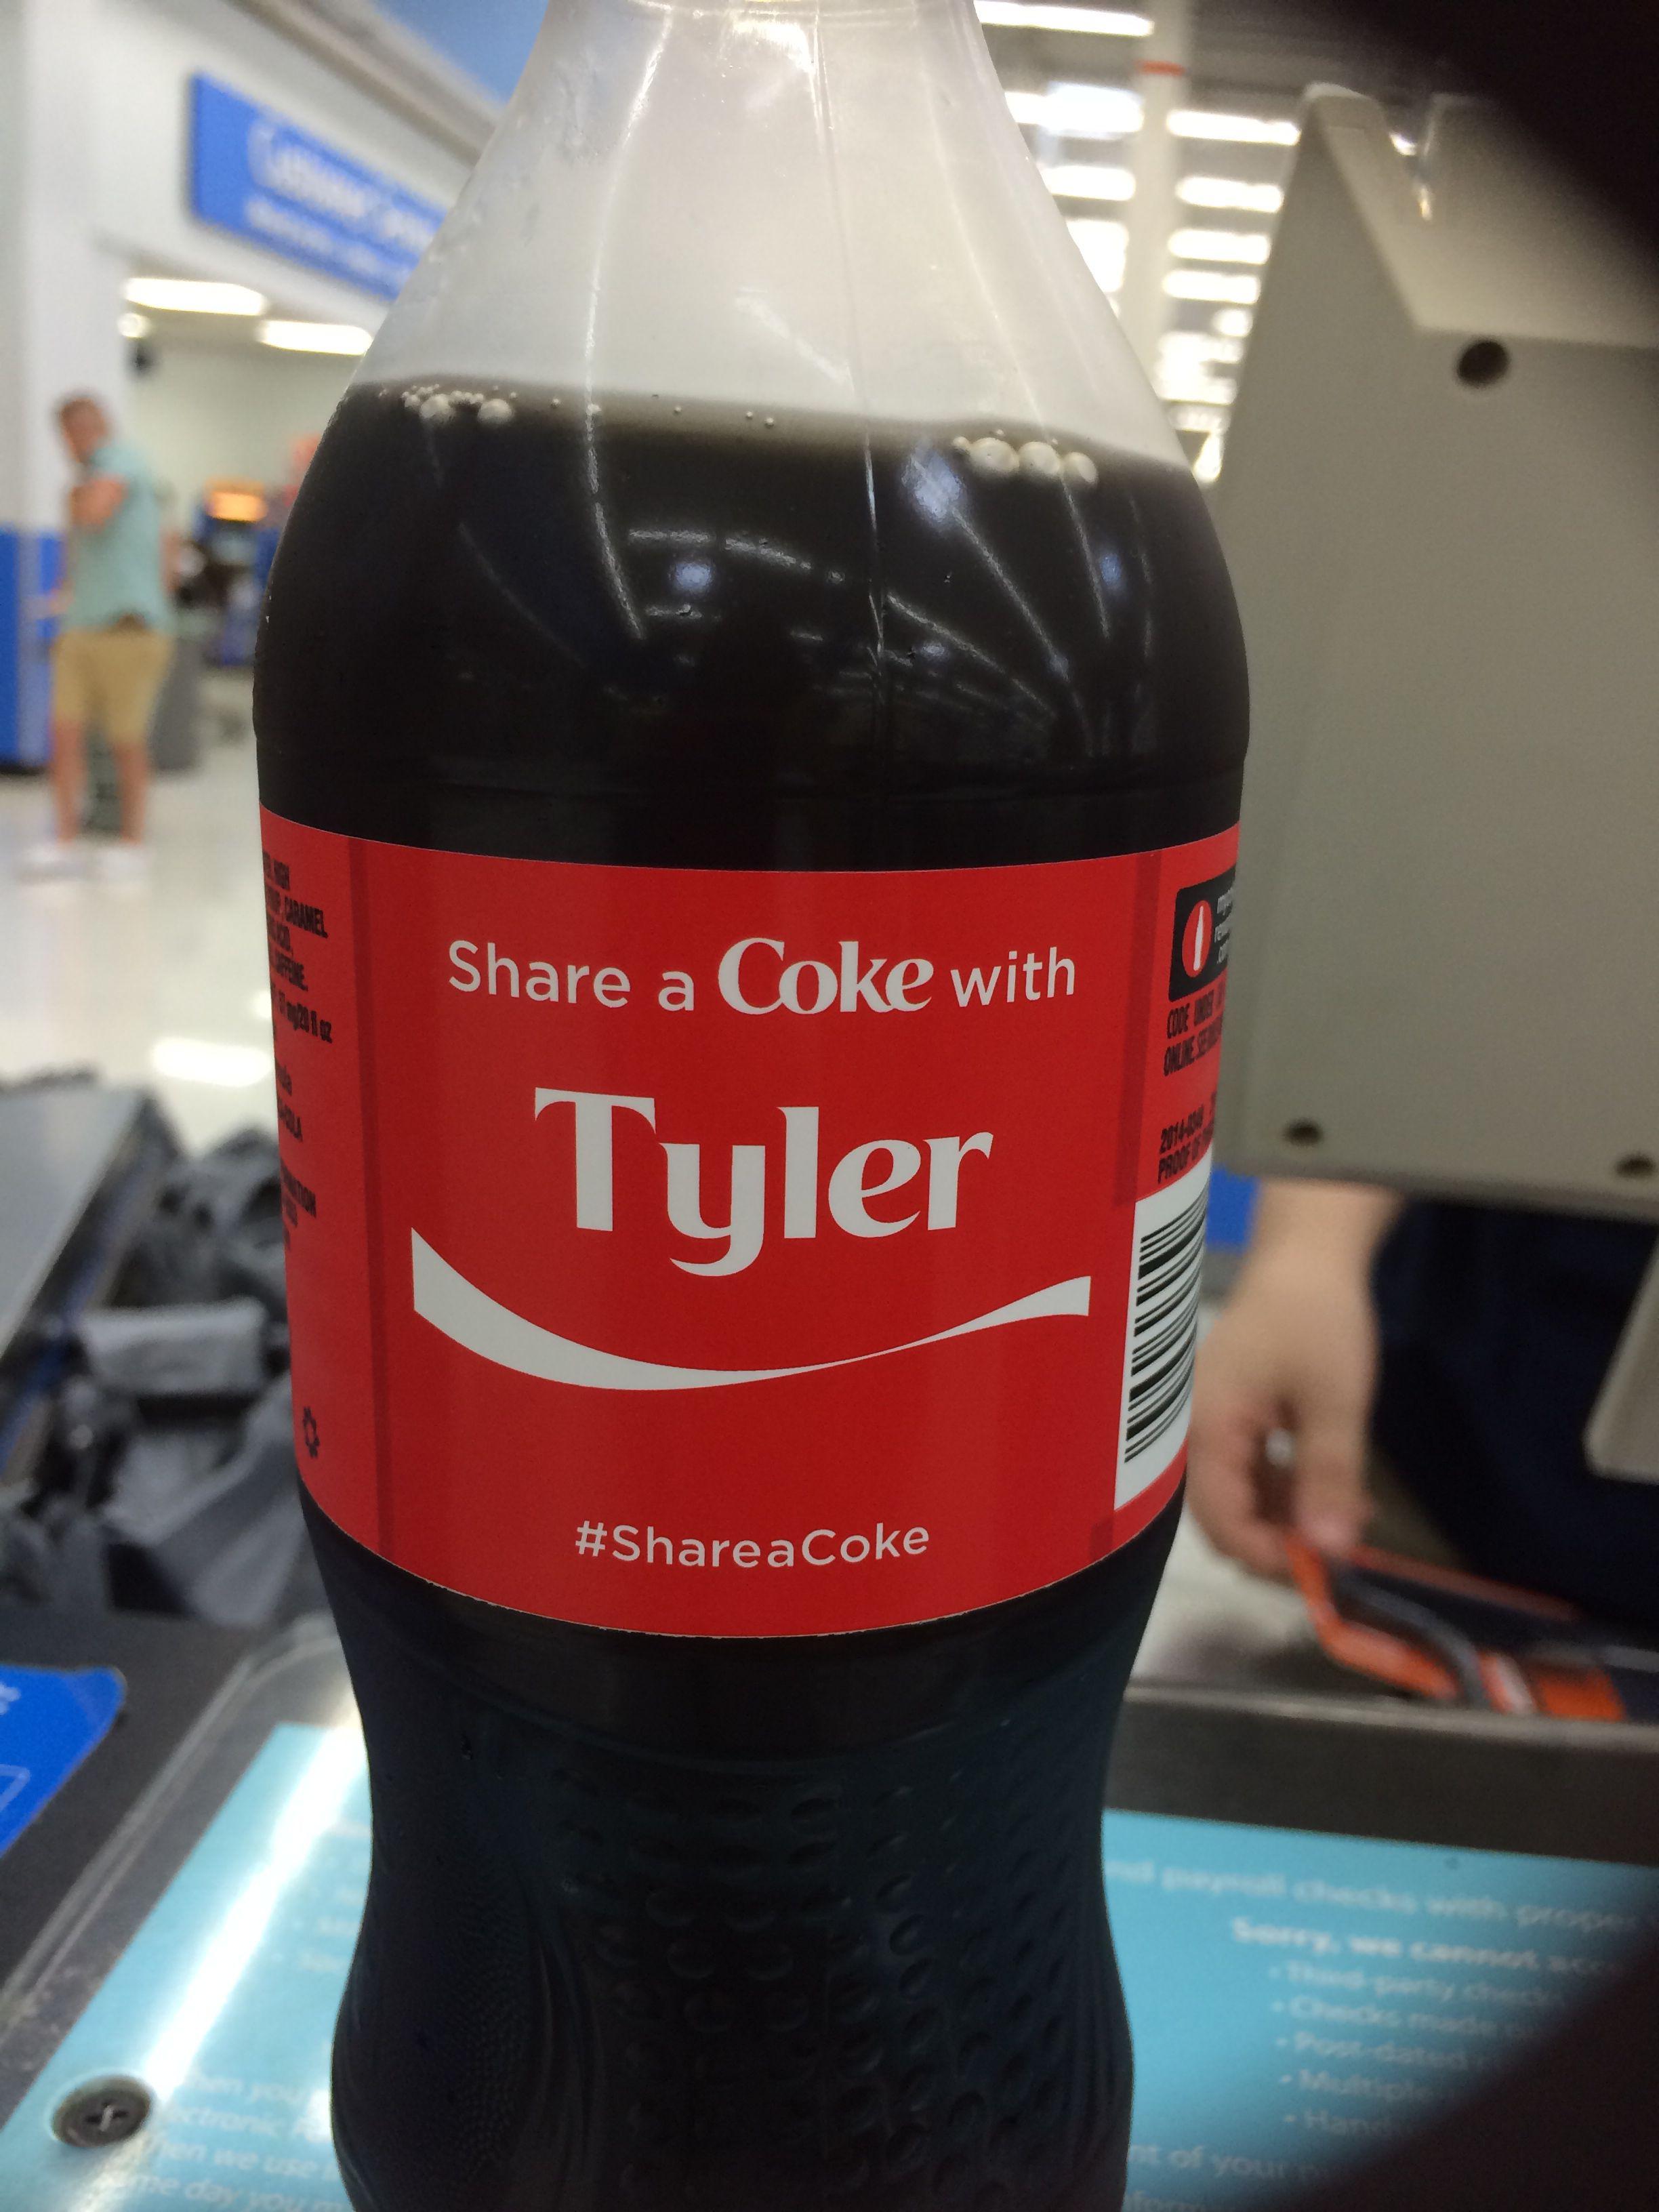 Funny Share A Coke With Names : funny, share, names, Bottles, Names, Share, Coke,, Bottle,